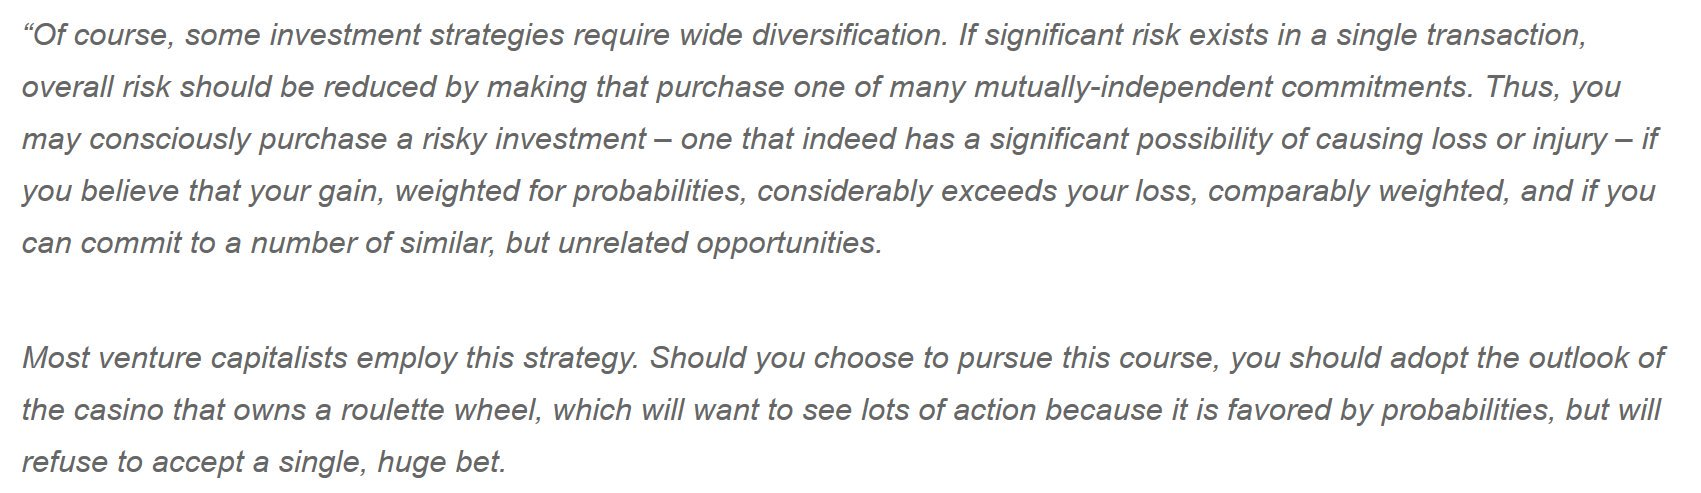 Warren Buffett, on Diversification and Portfolio Construction